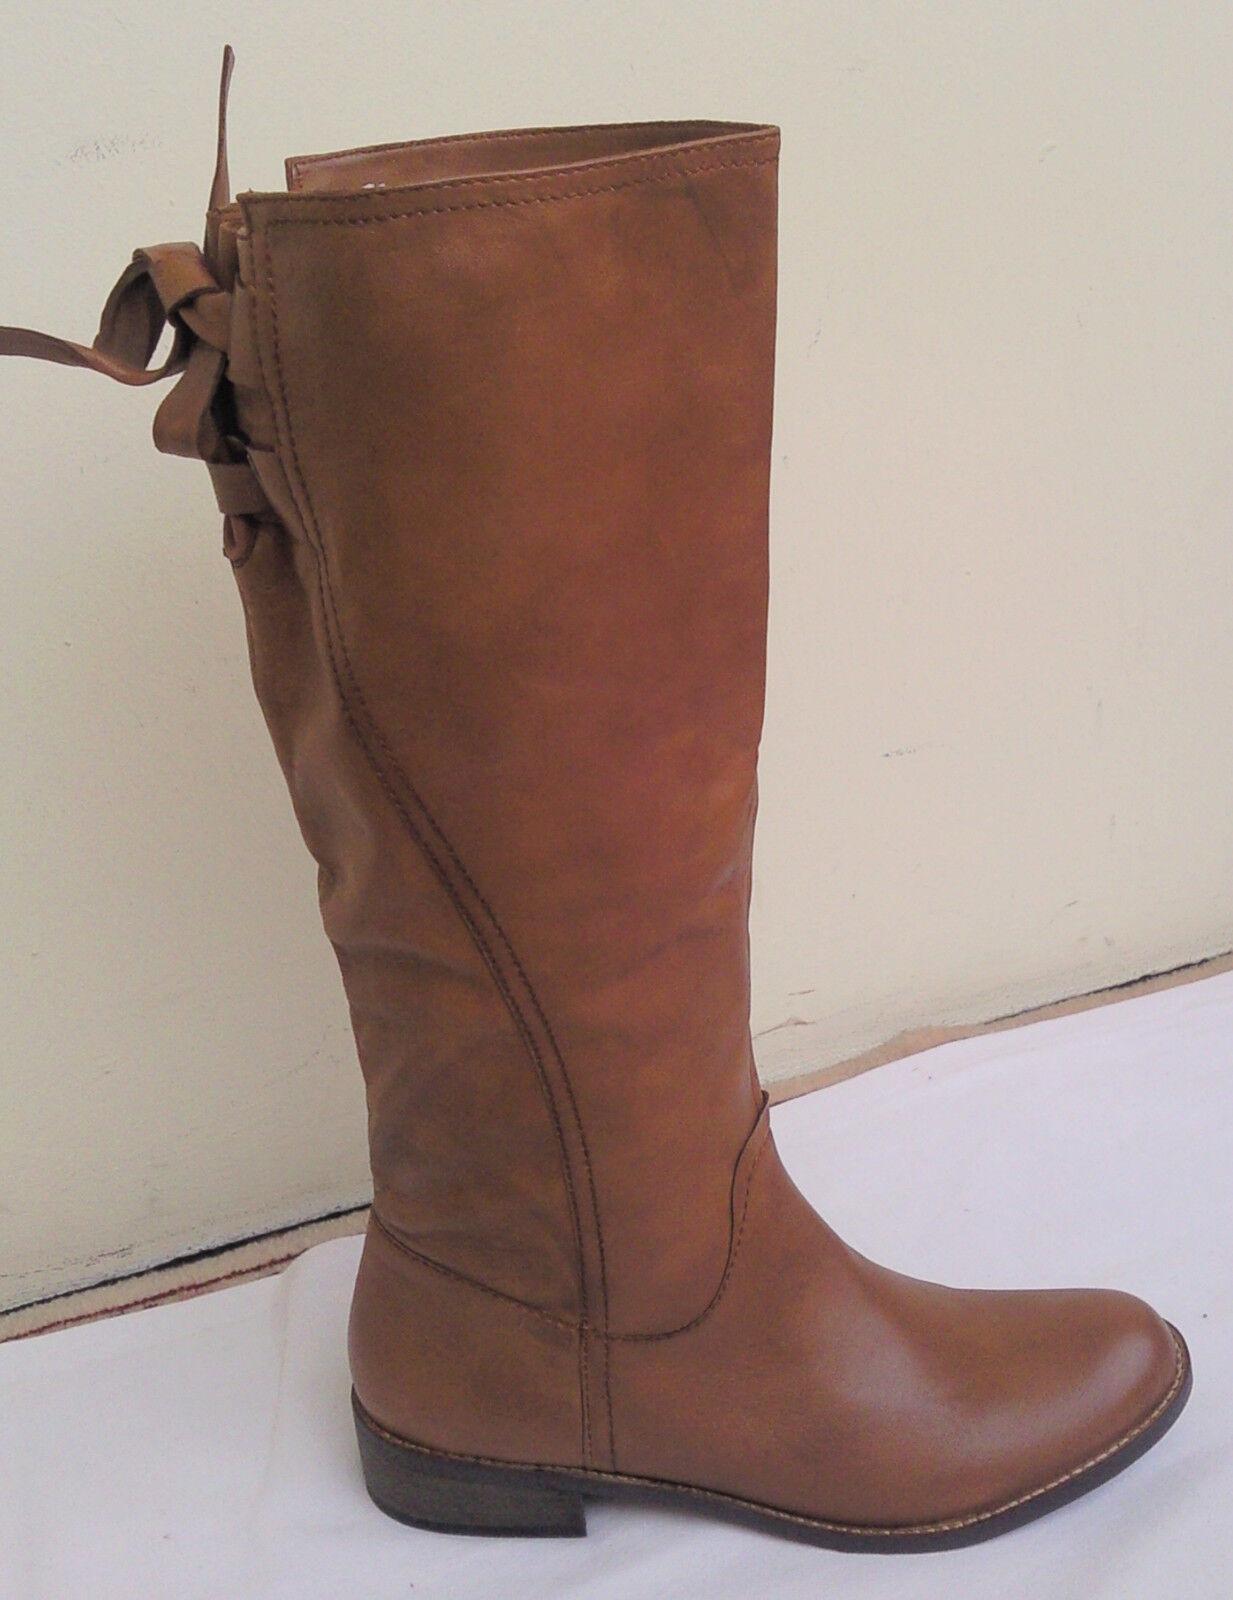 SPM Niagara, Leder, elegante Damen Stiefel, echtes Leder, Niagara, hellbraun, NEU, Gr. 38 7bad31